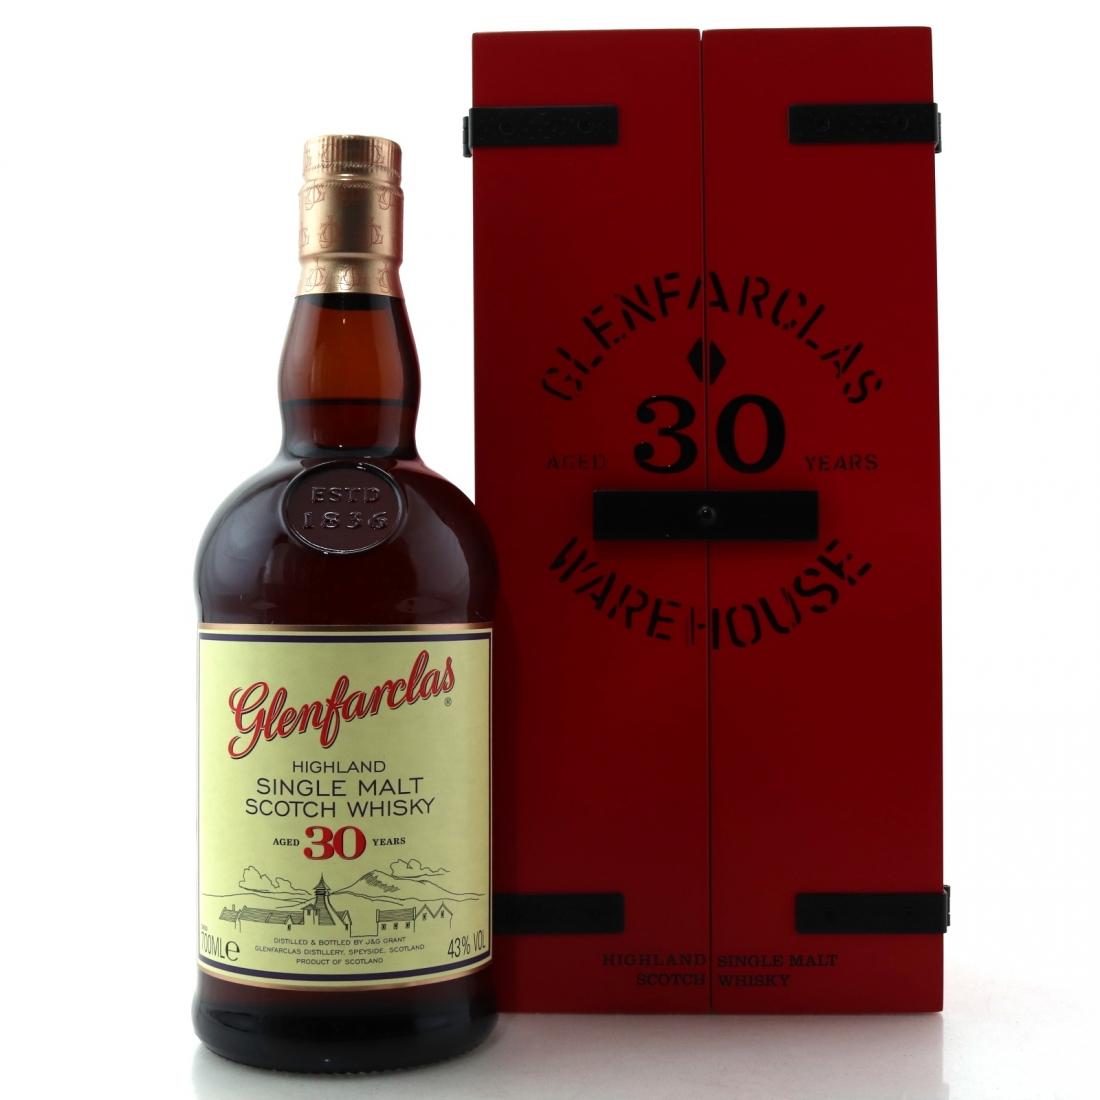 Glenfarclas 30 Year Old / Warehouse Box